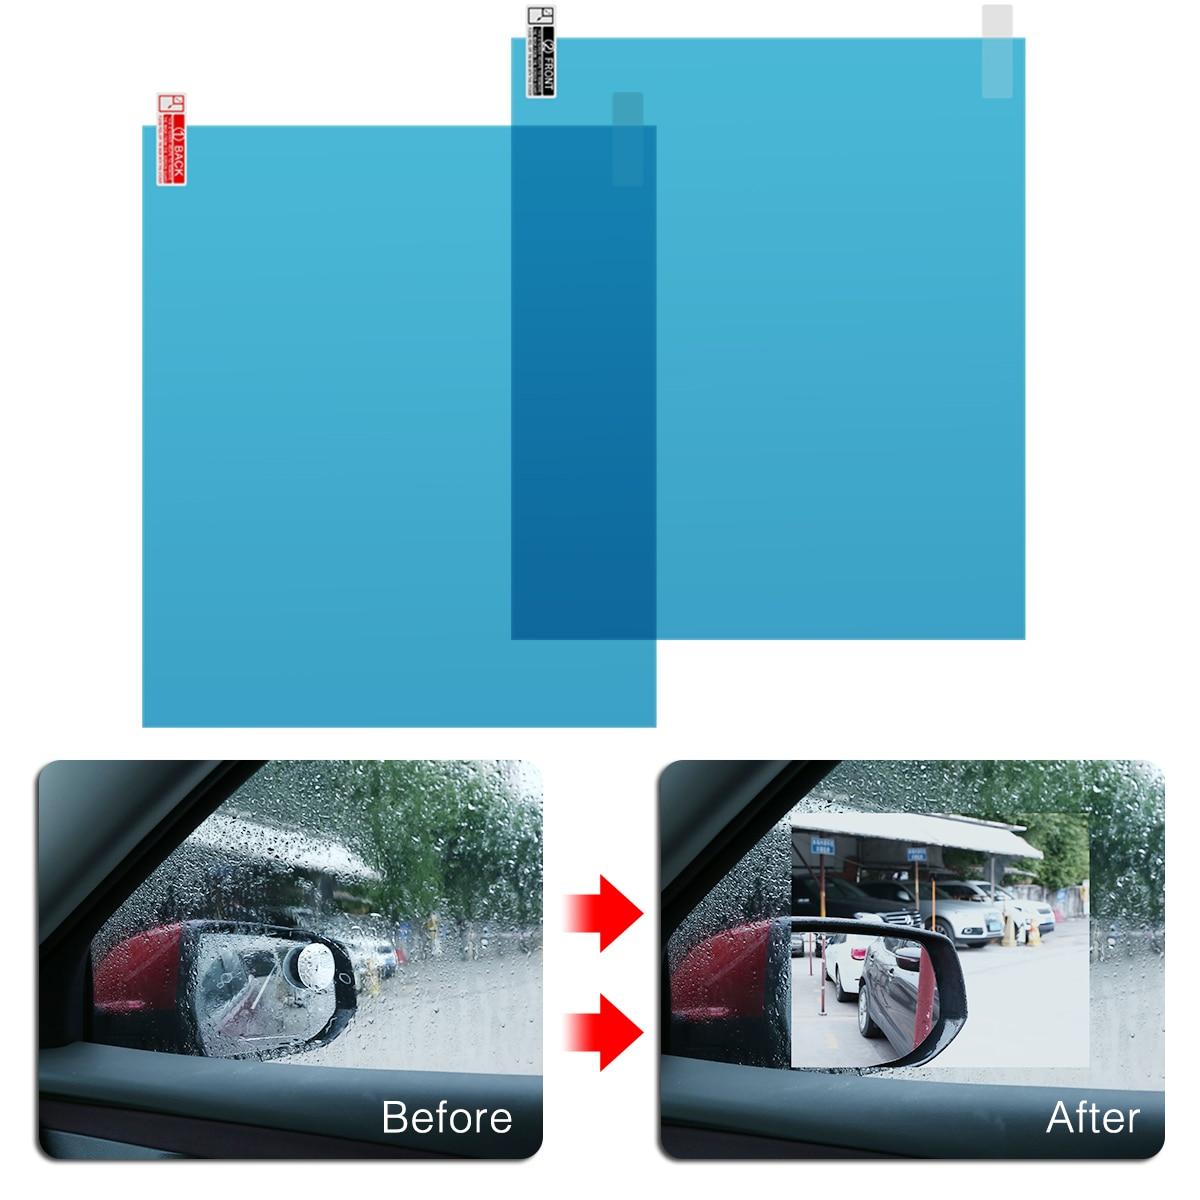 2Pcs 170*200mm Car Anti Water Anti Fog Window Film Window Protective Film Rainproof Rearview Mirror Car Accessories